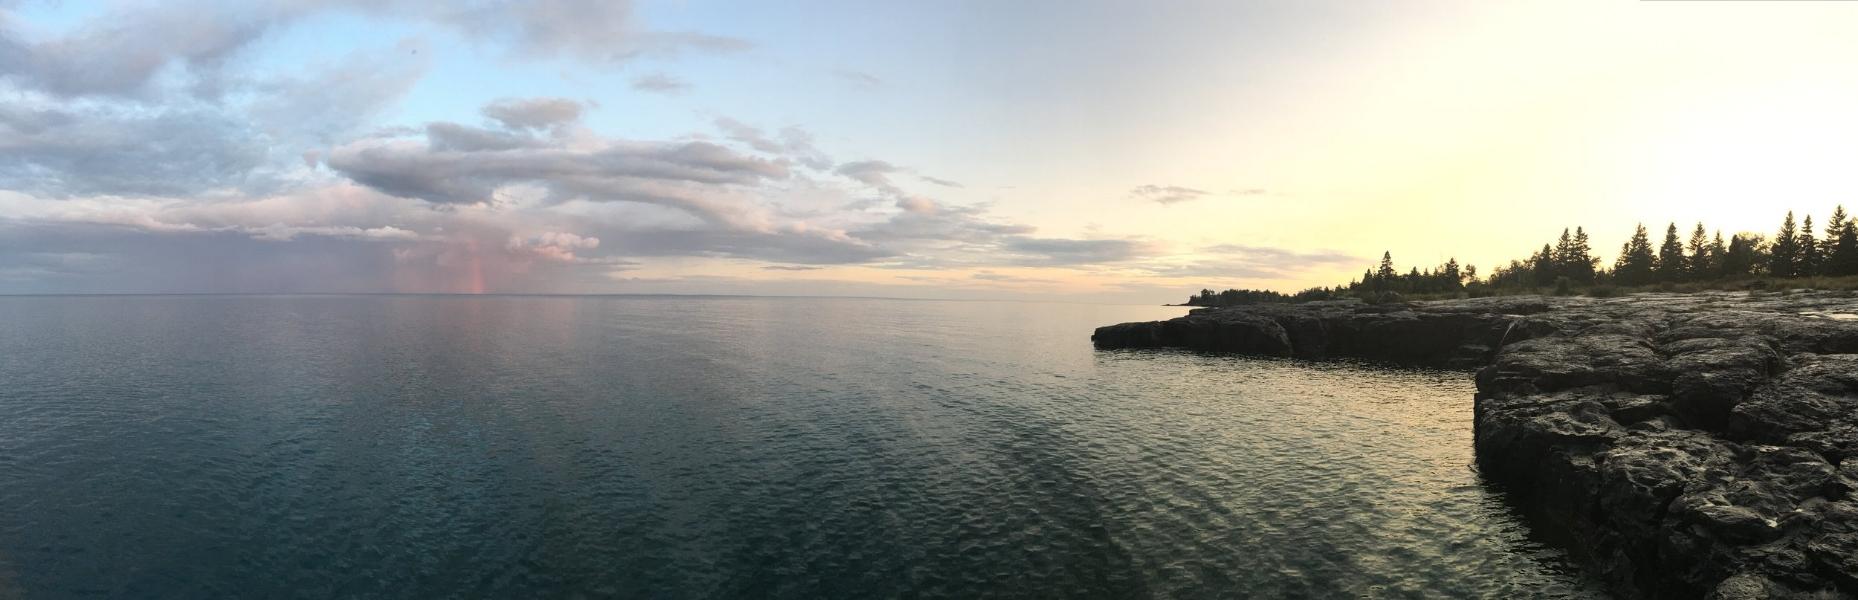 Lake Superior and a rainbow